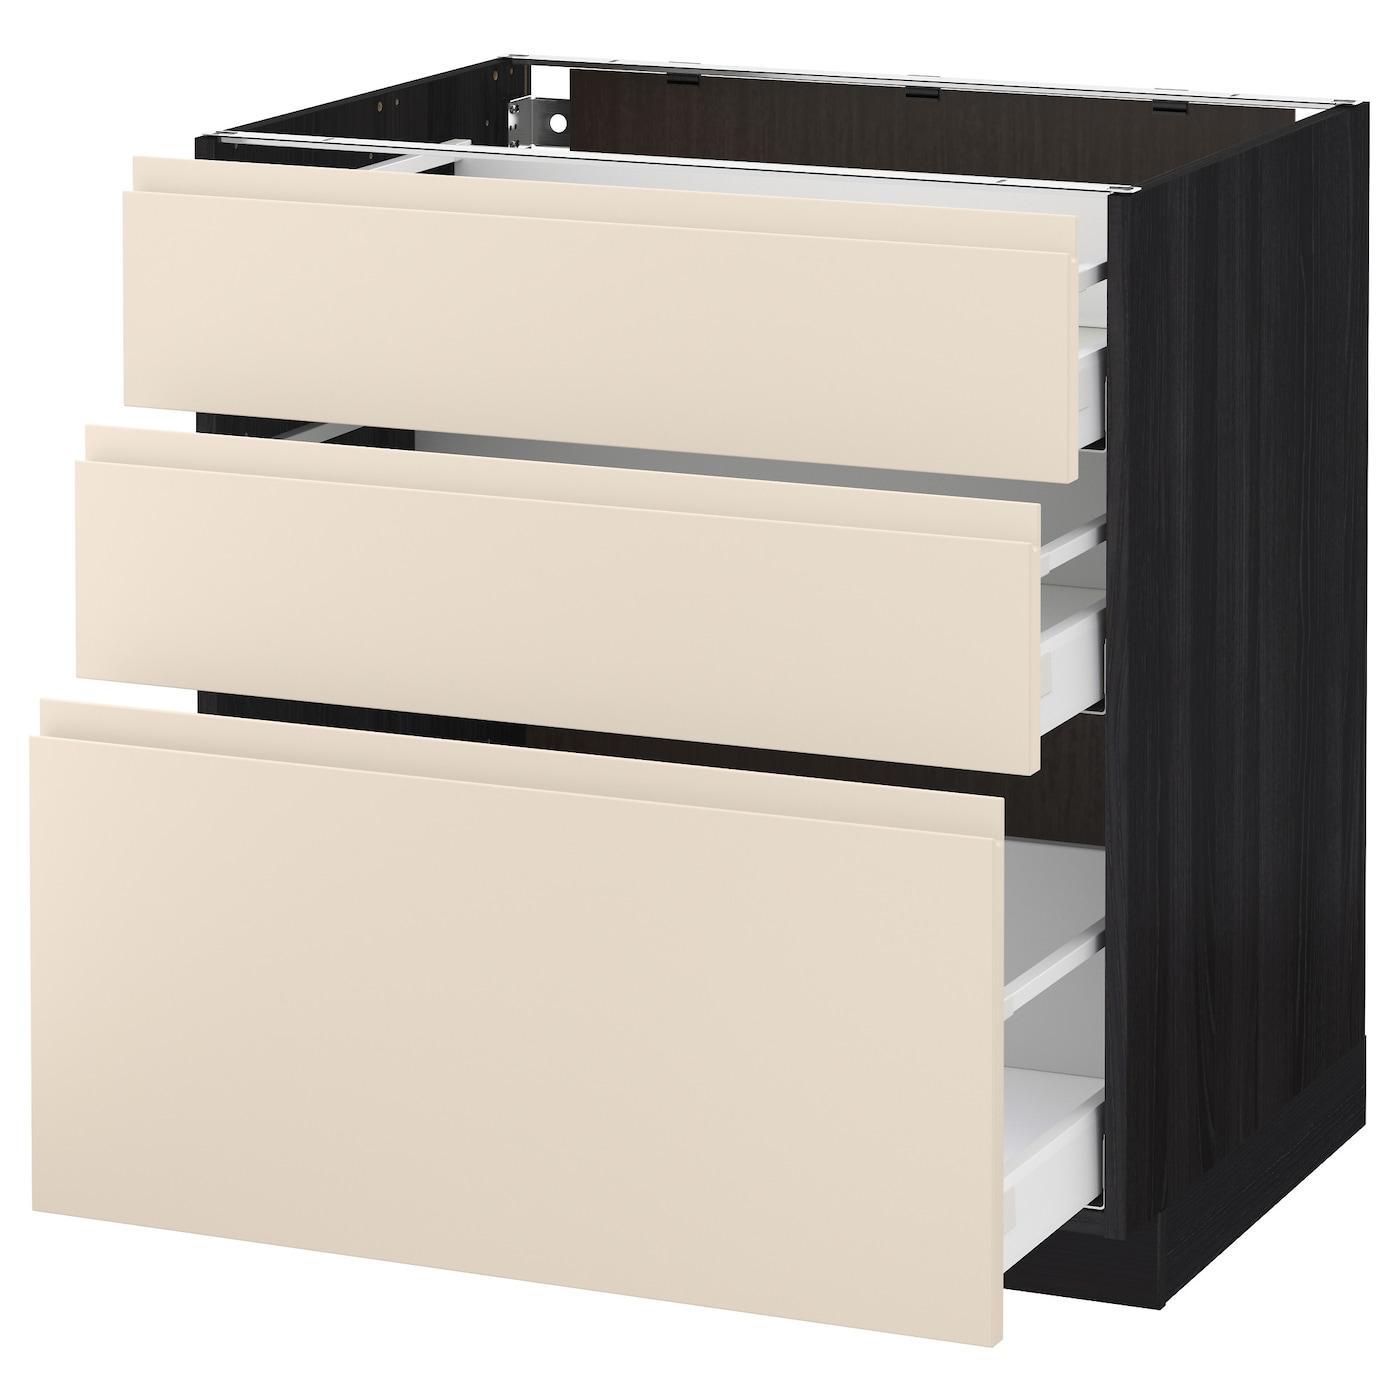 metod maximera base cabinet with 3 drawers black voxtorp light beige 80x60 cm ikea. Black Bedroom Furniture Sets. Home Design Ideas